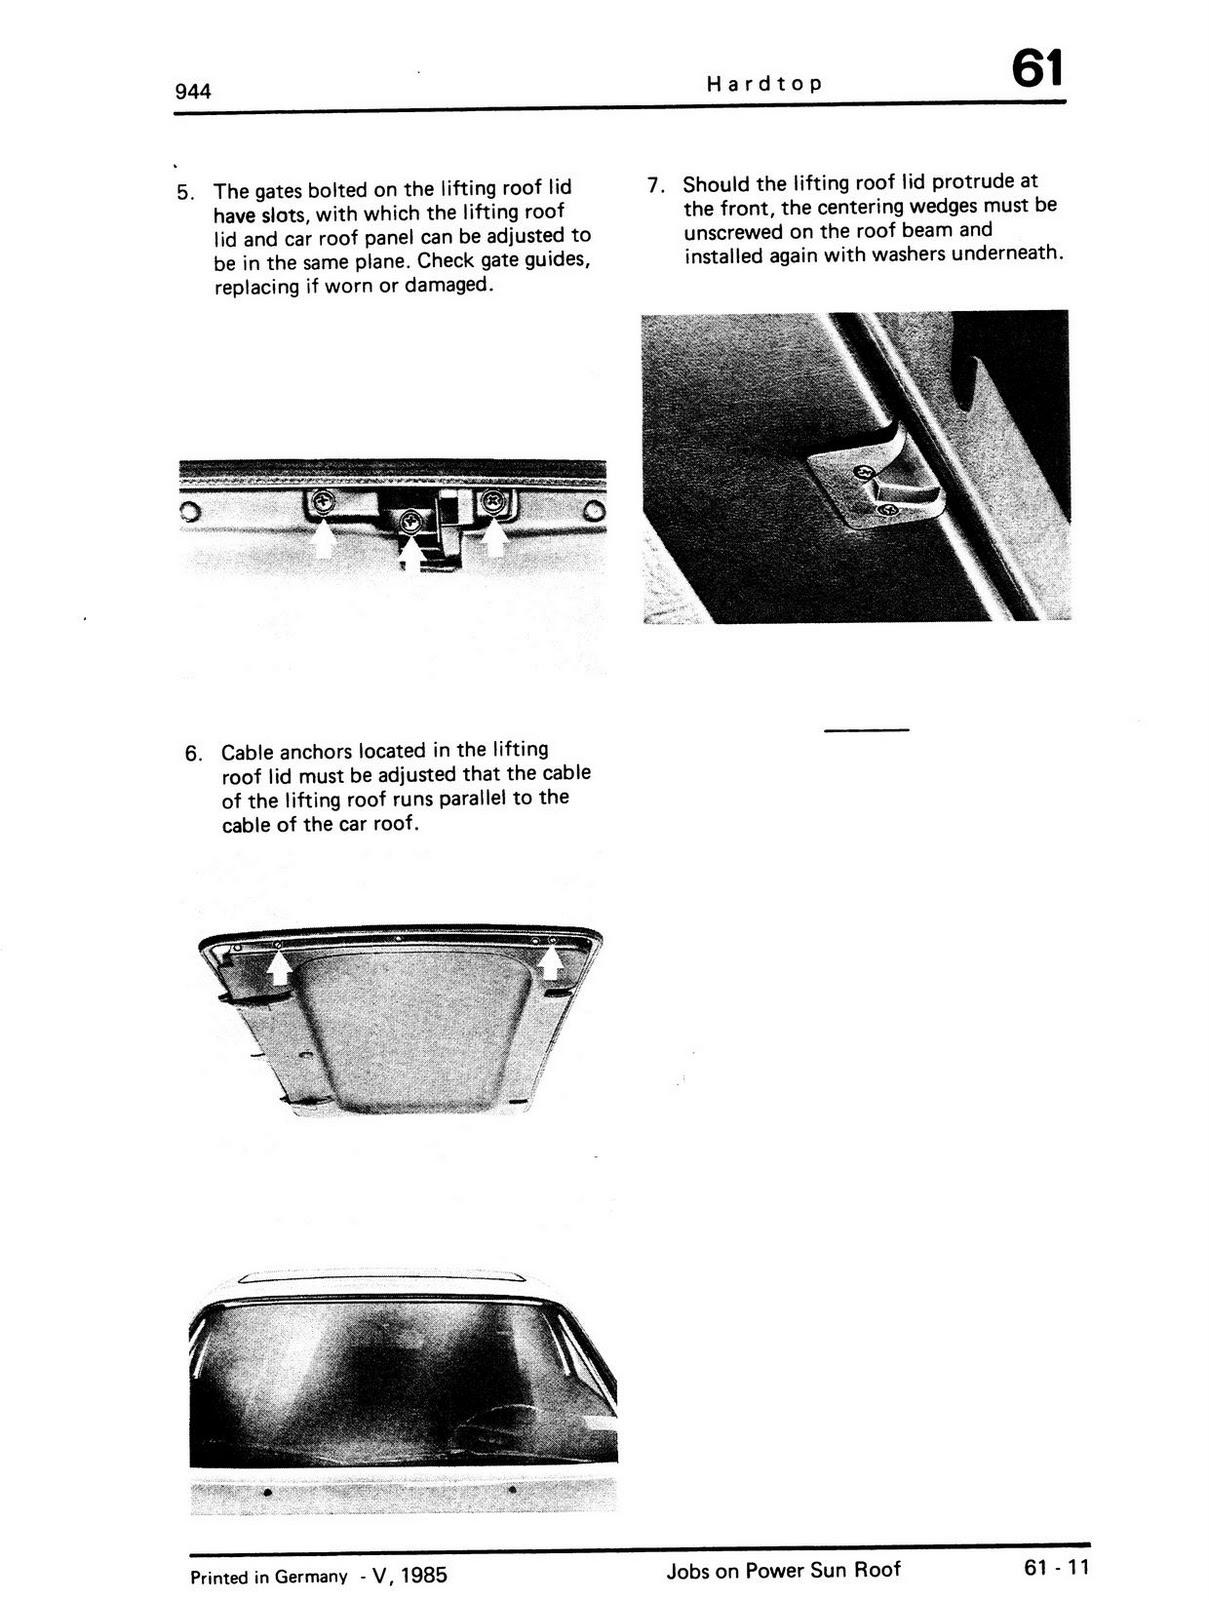 [SCHEMATICS_48ZD]  944 Foot To The Floor: How to repair sunroof on a Porsche 944 (Square Dash  model)   1984 Porsche 944 Sunroof Wiring Diagram      944 Foot To The Floor - blogger